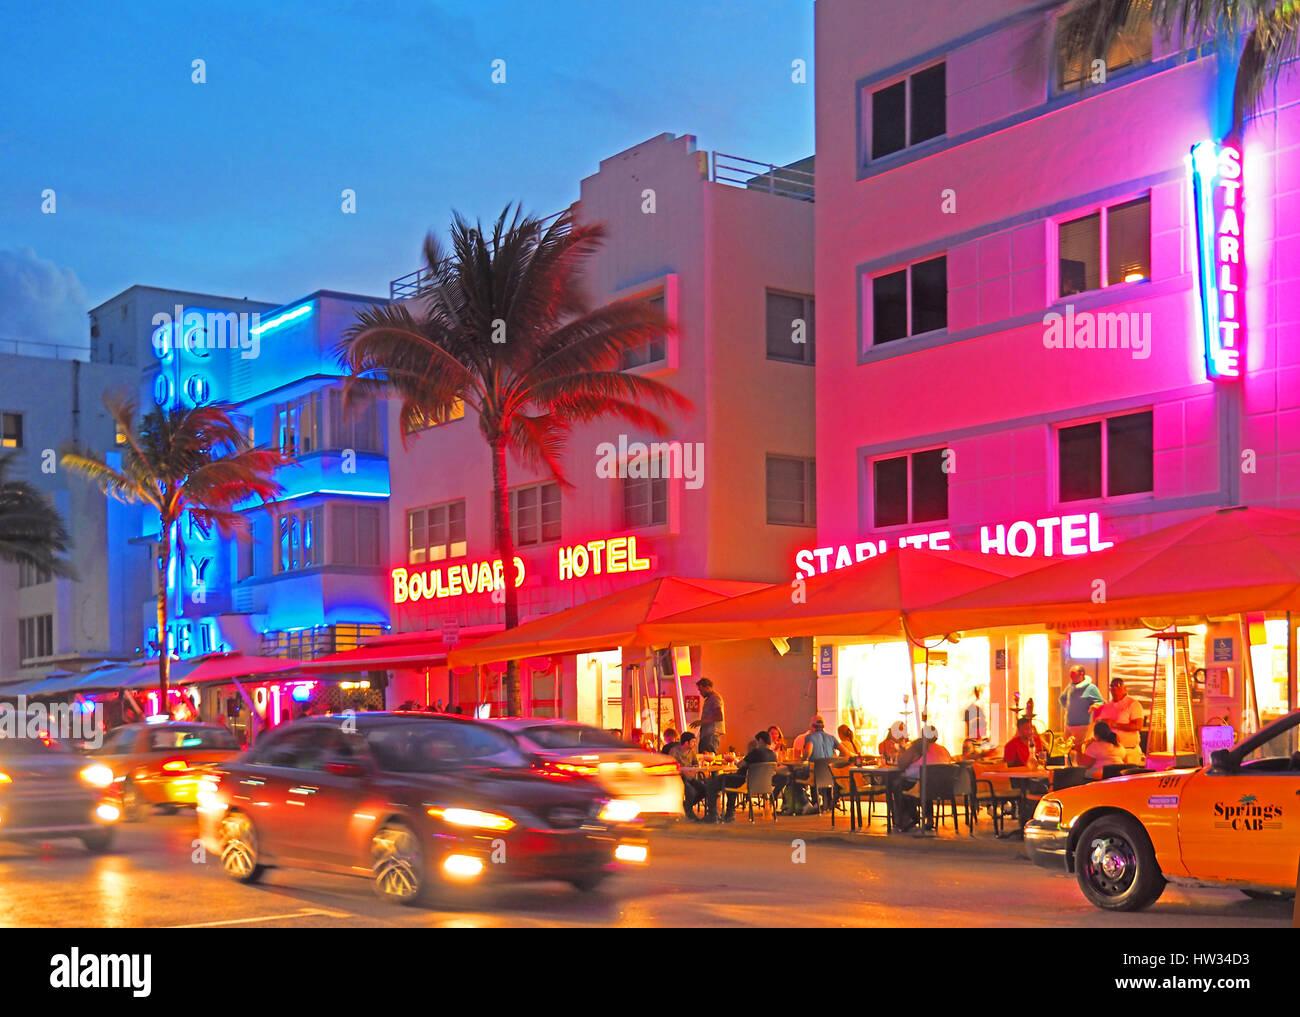 South Beach Art Deco District in Miami. - Stock Image